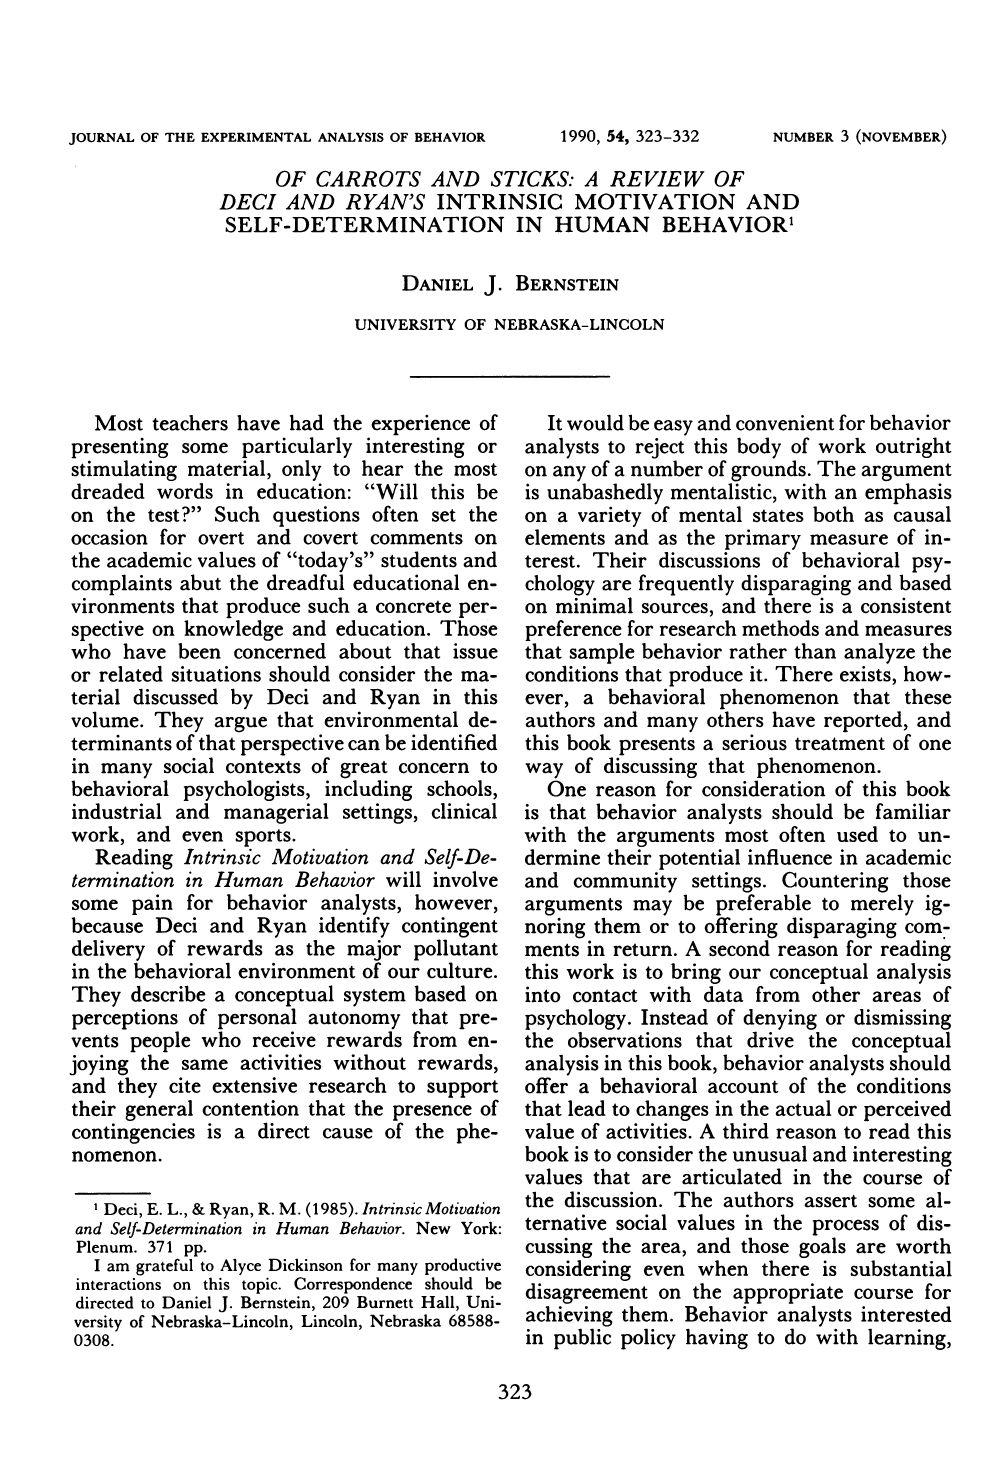 intrinsic motivation and self determination in human behavior pdf